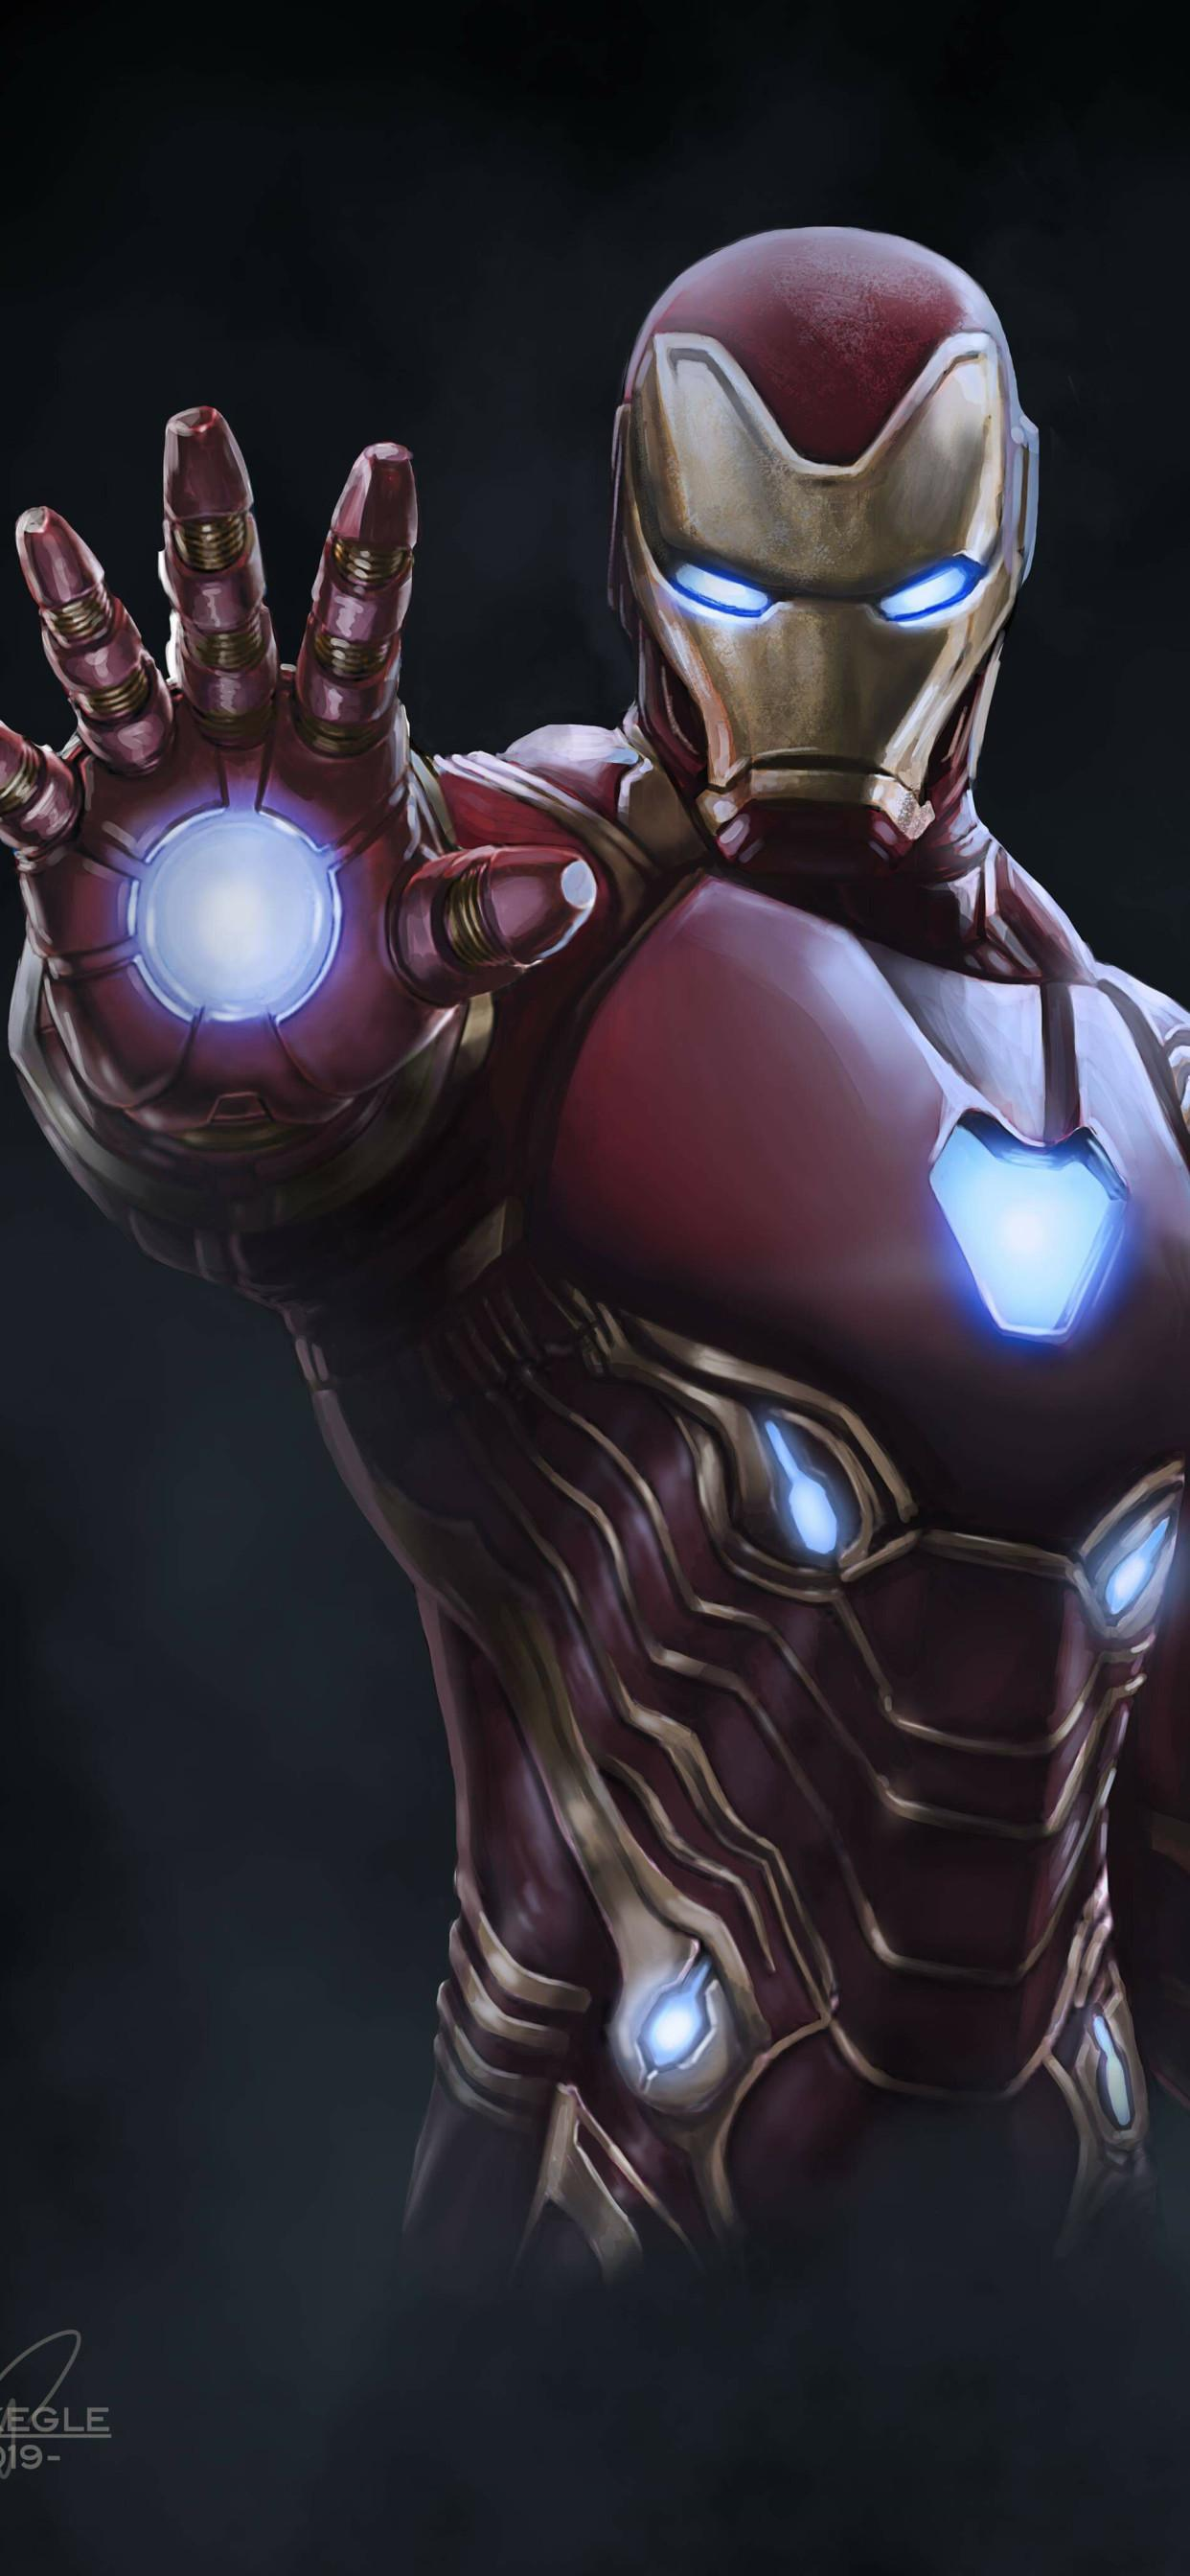 iPhone Iron Man 4k Wallpapers - Wallpaper Cave